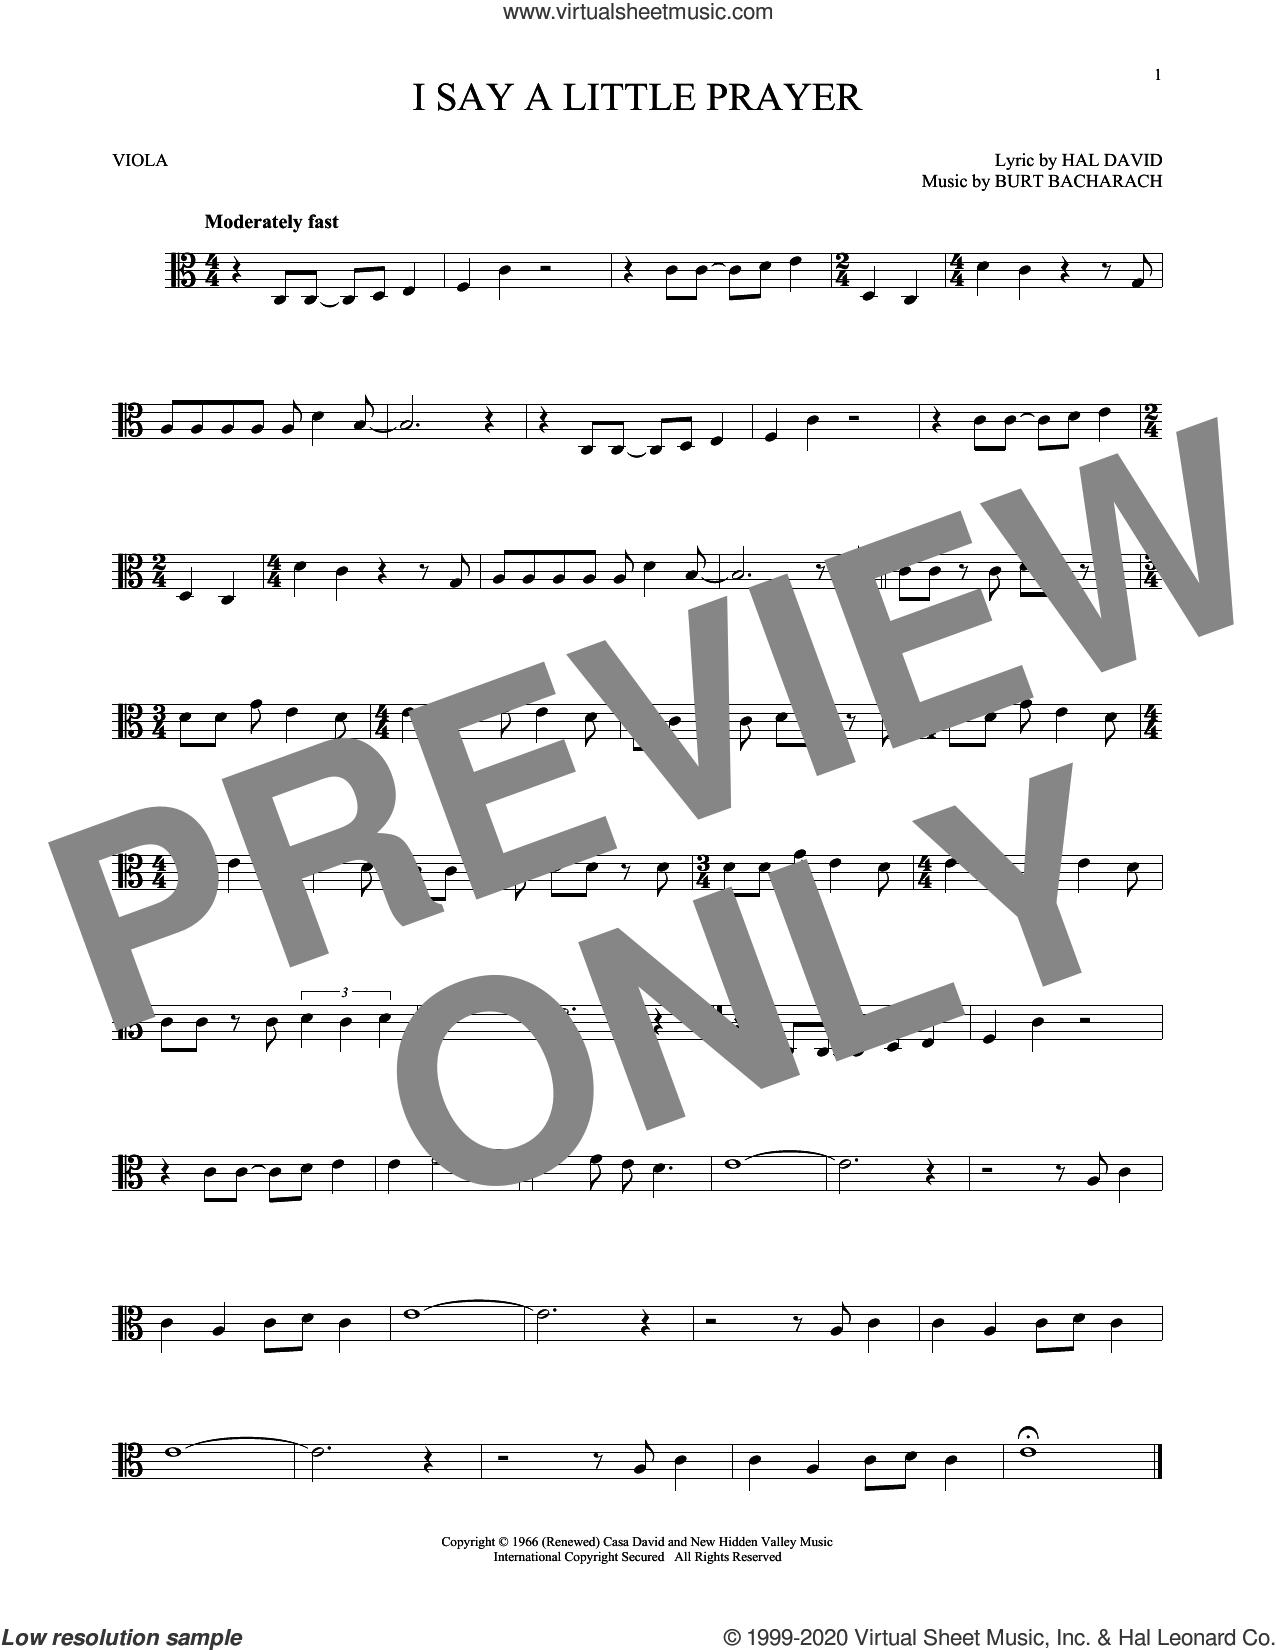 I Say A Little Prayer sheet music for viola solo by Burt Bacharach, Bacharach & David and Hal David, intermediate skill level